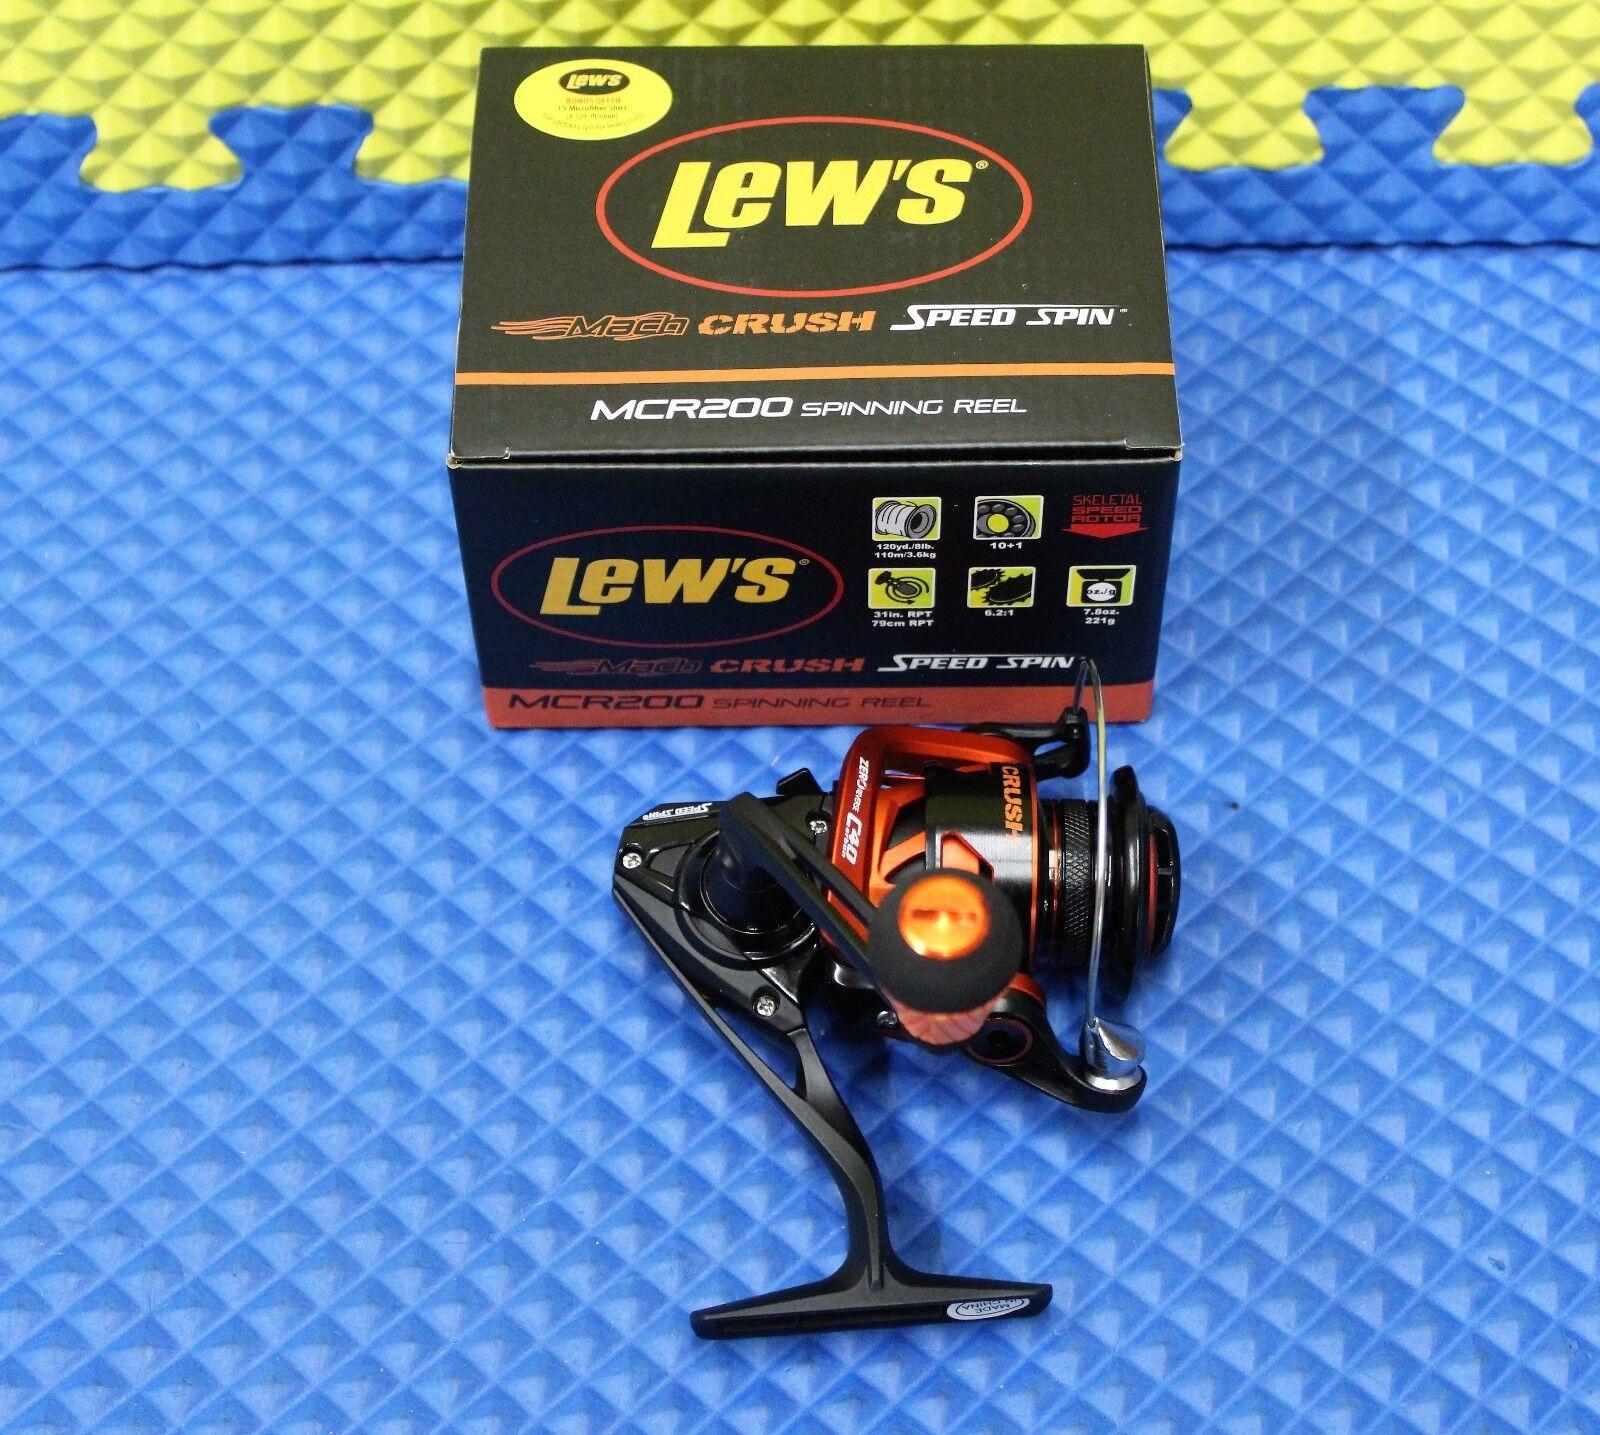 Lew's  Mach Crush Speed Spin Spinning Reel MCR200